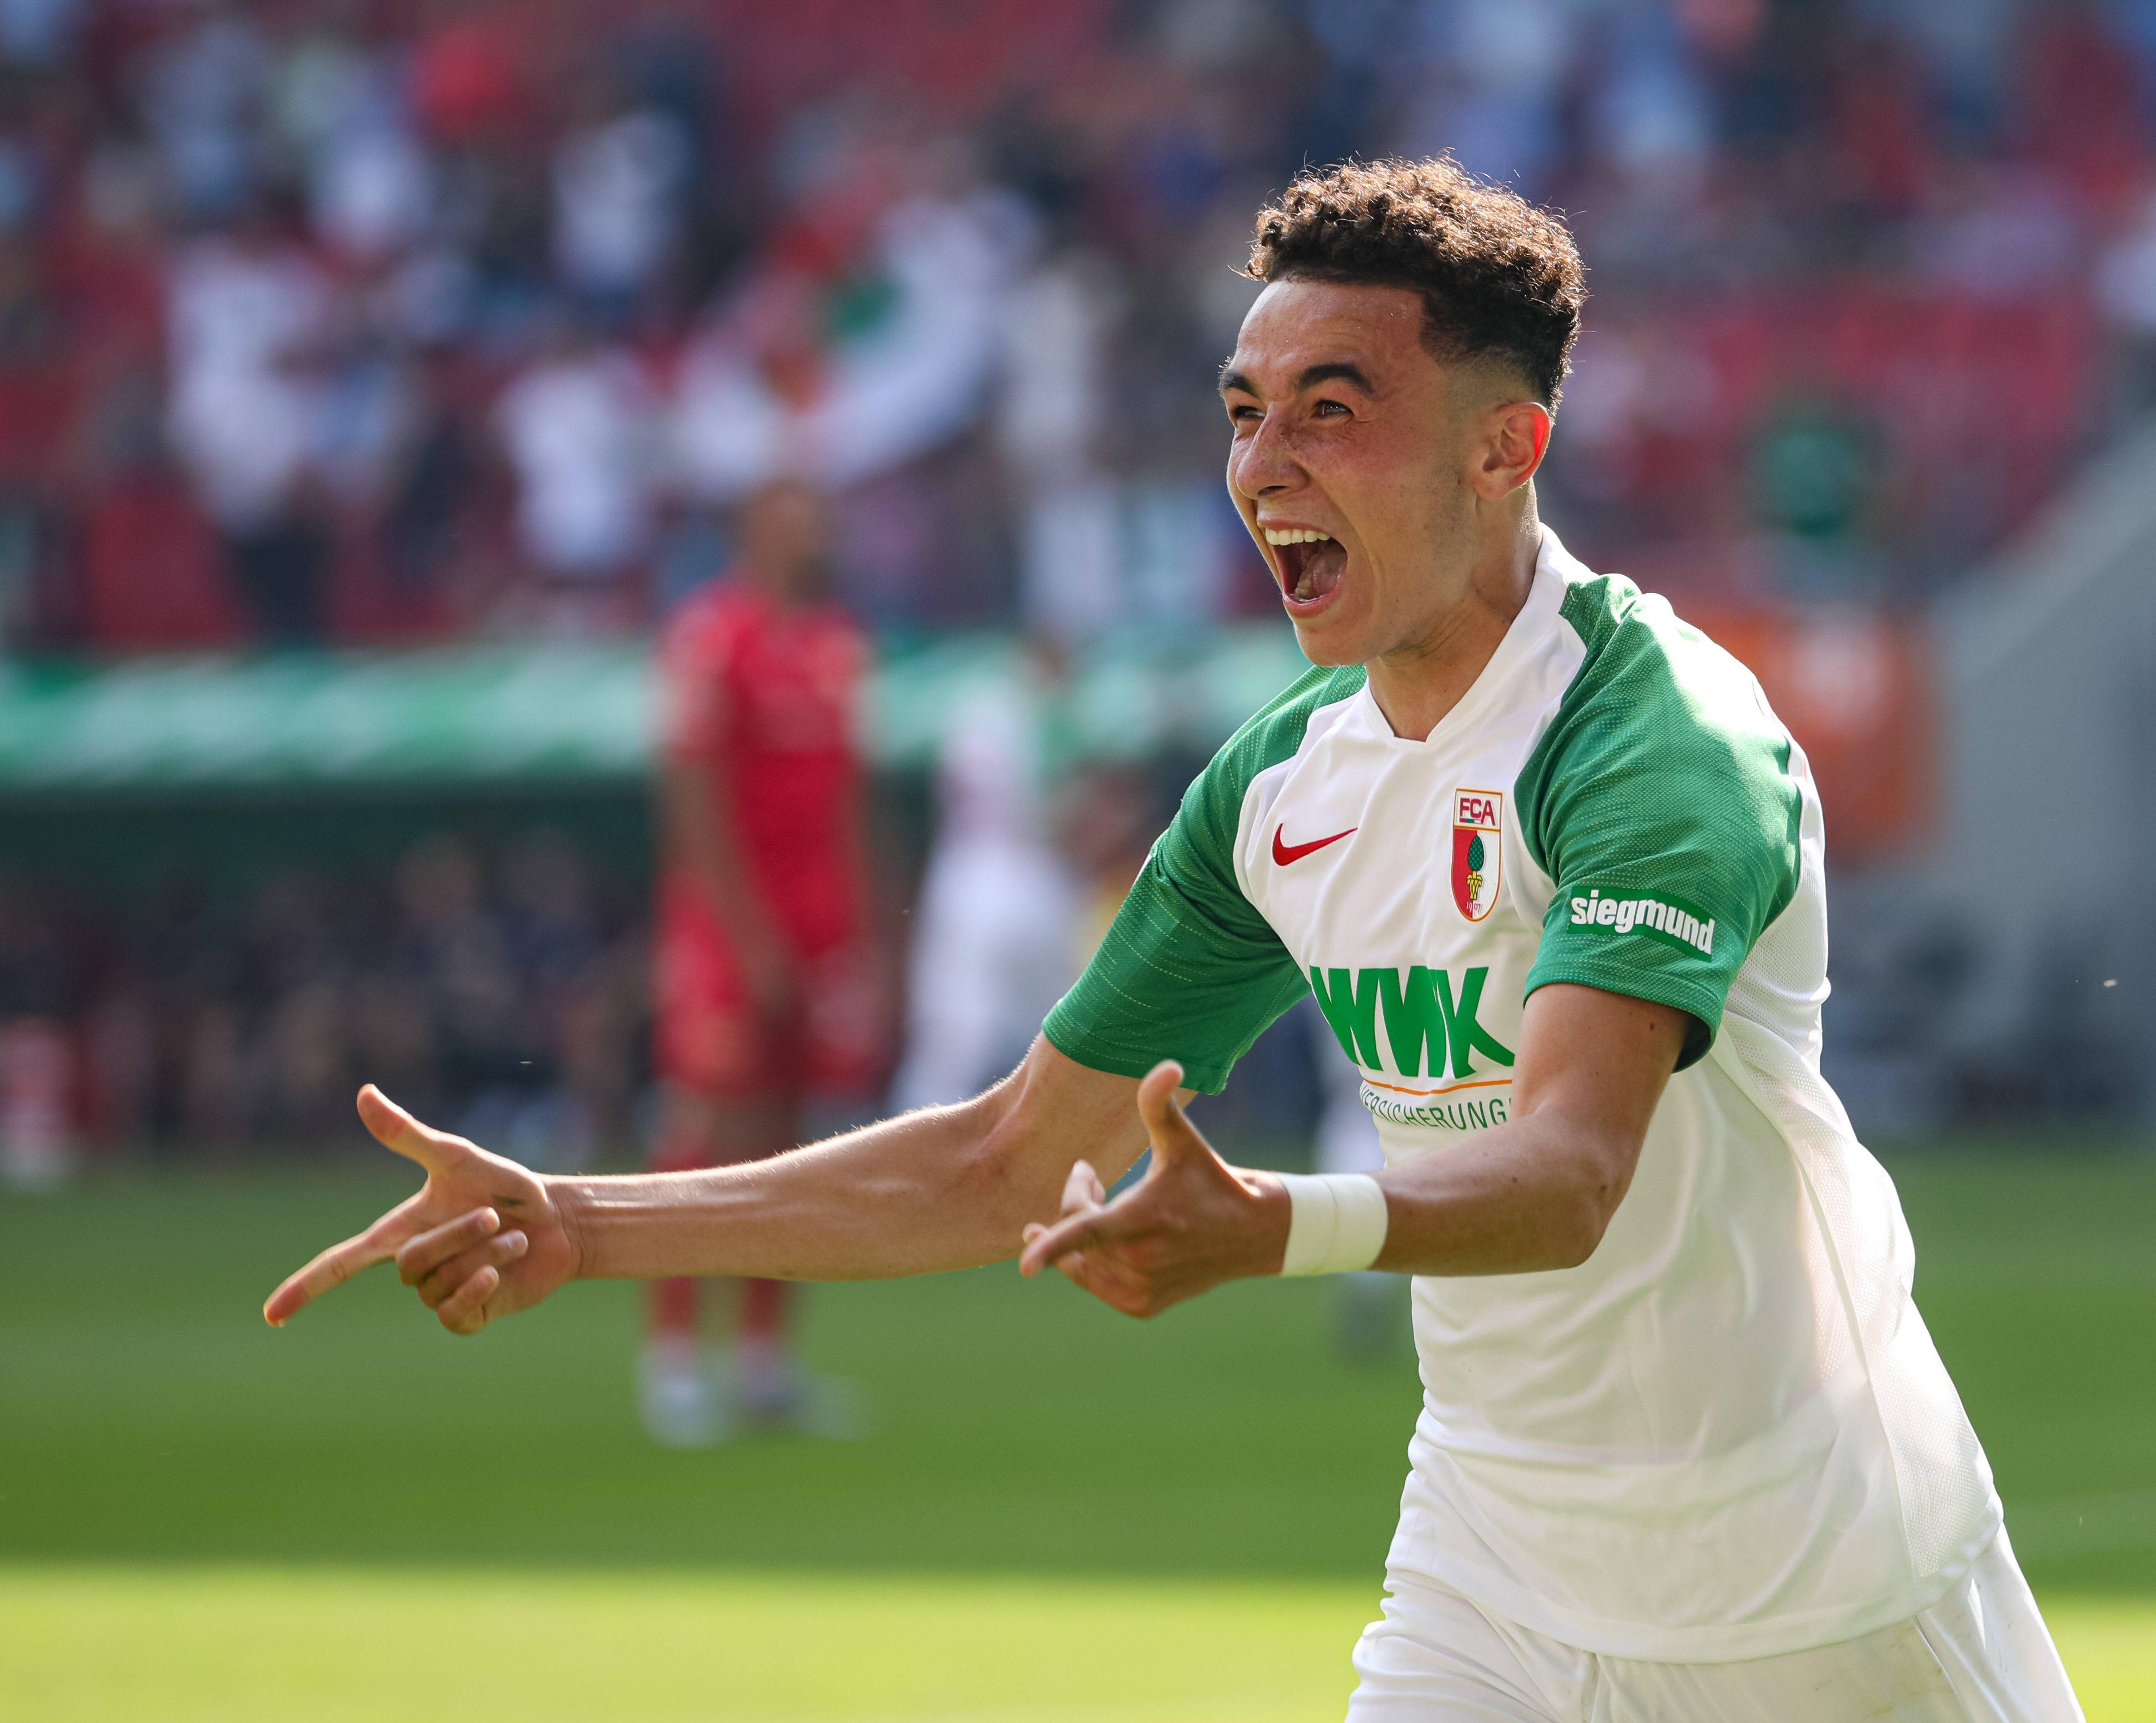 Bundesliga | Who is Ruben Vargas: Augsburg's NextGen Switzerland star?